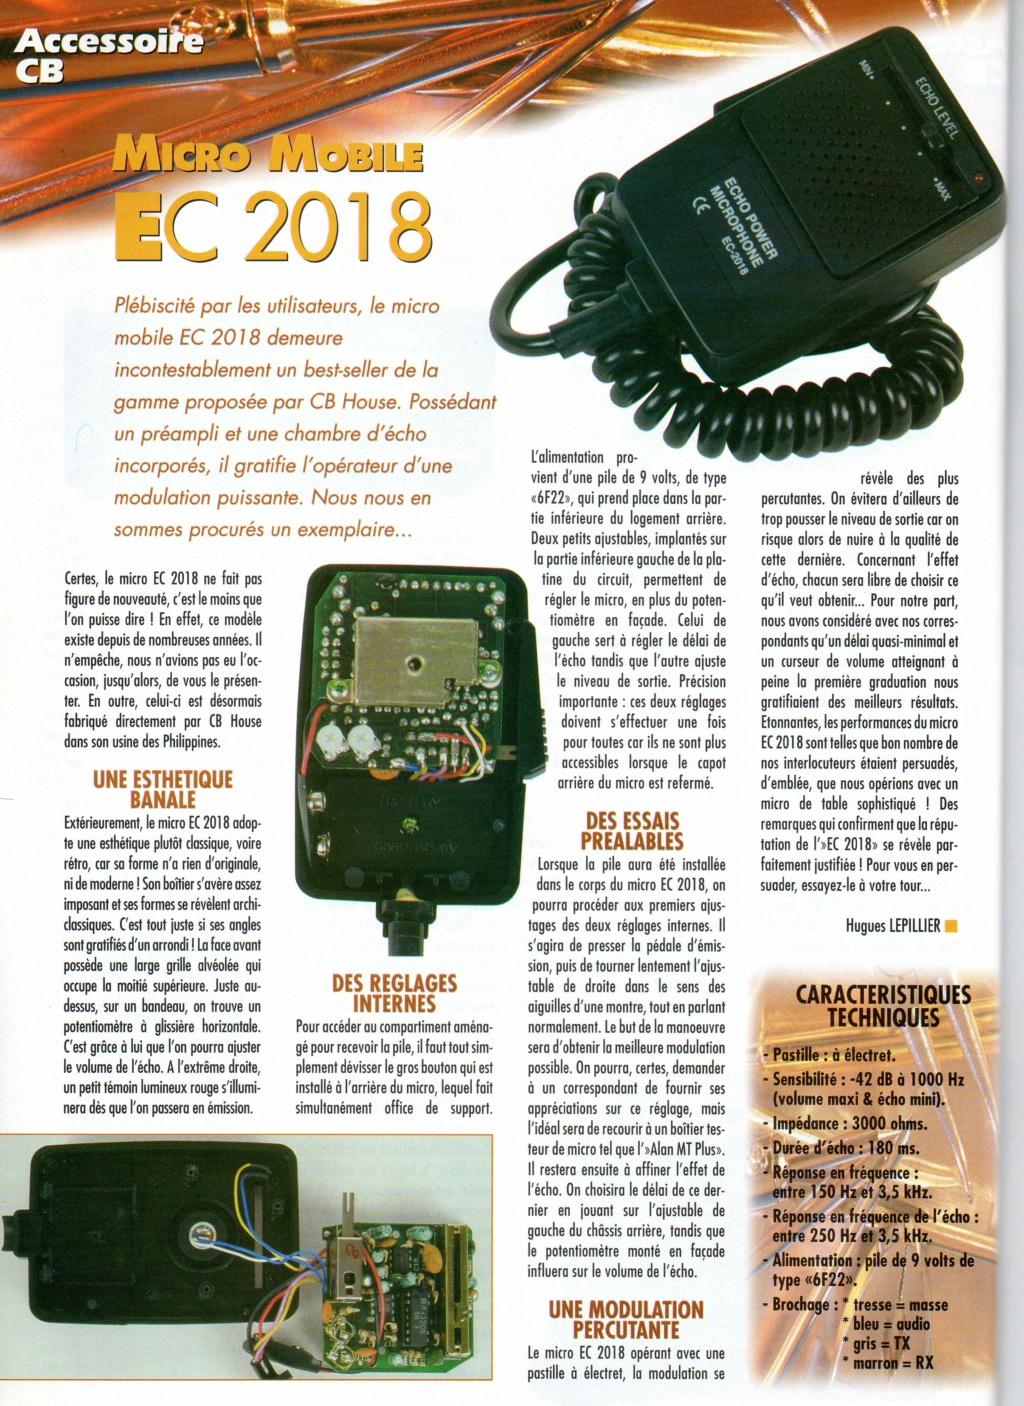 Micros - KM-2018 P4 & CRT EC-2018 P6 (ou P4 (Micros mobile) Chora589